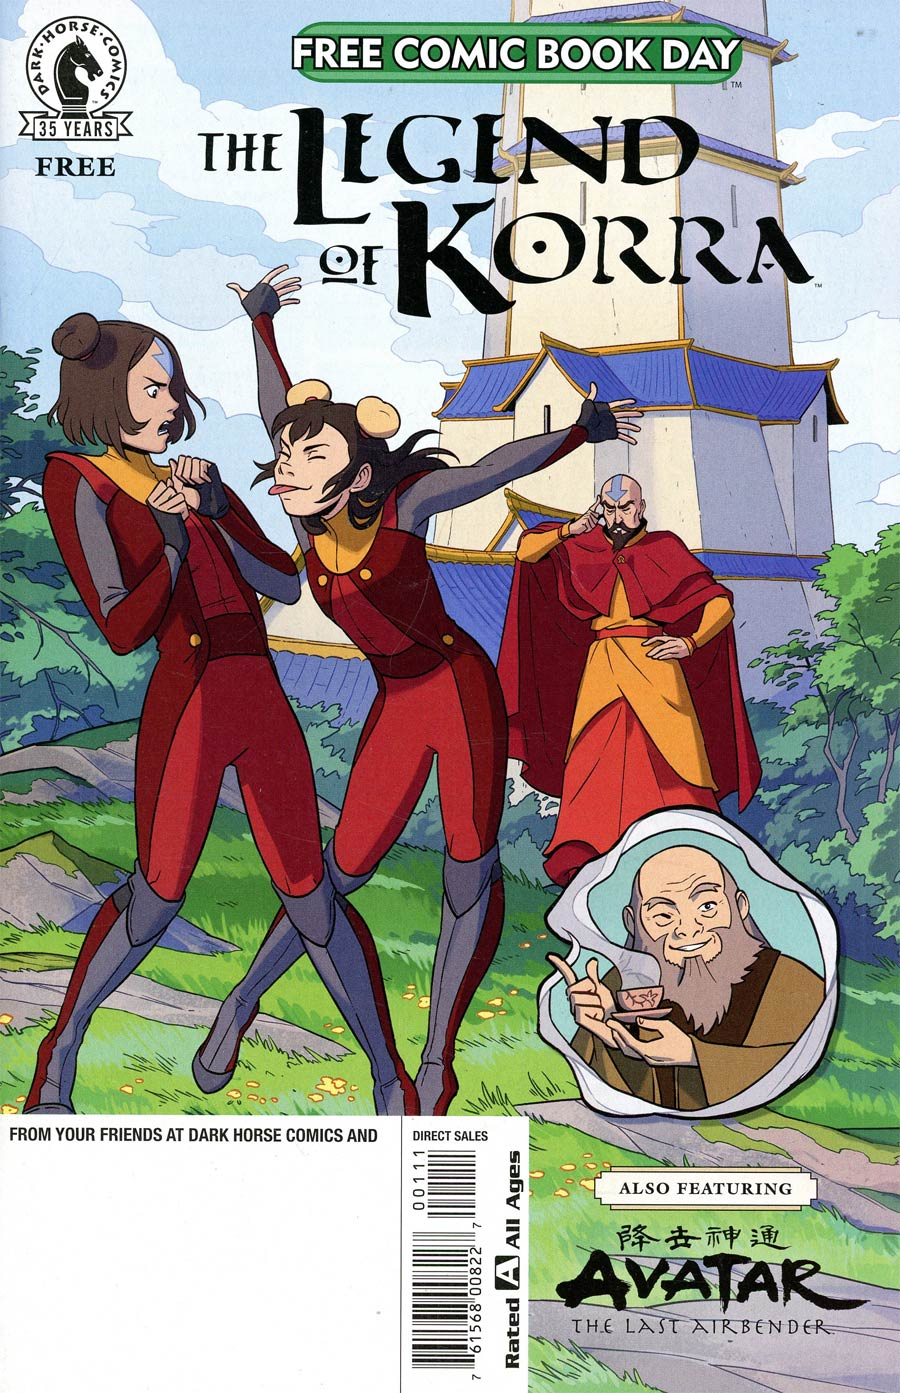 Legend Of Korra / Avatar The Last Airbender FCBD 2021 Edition